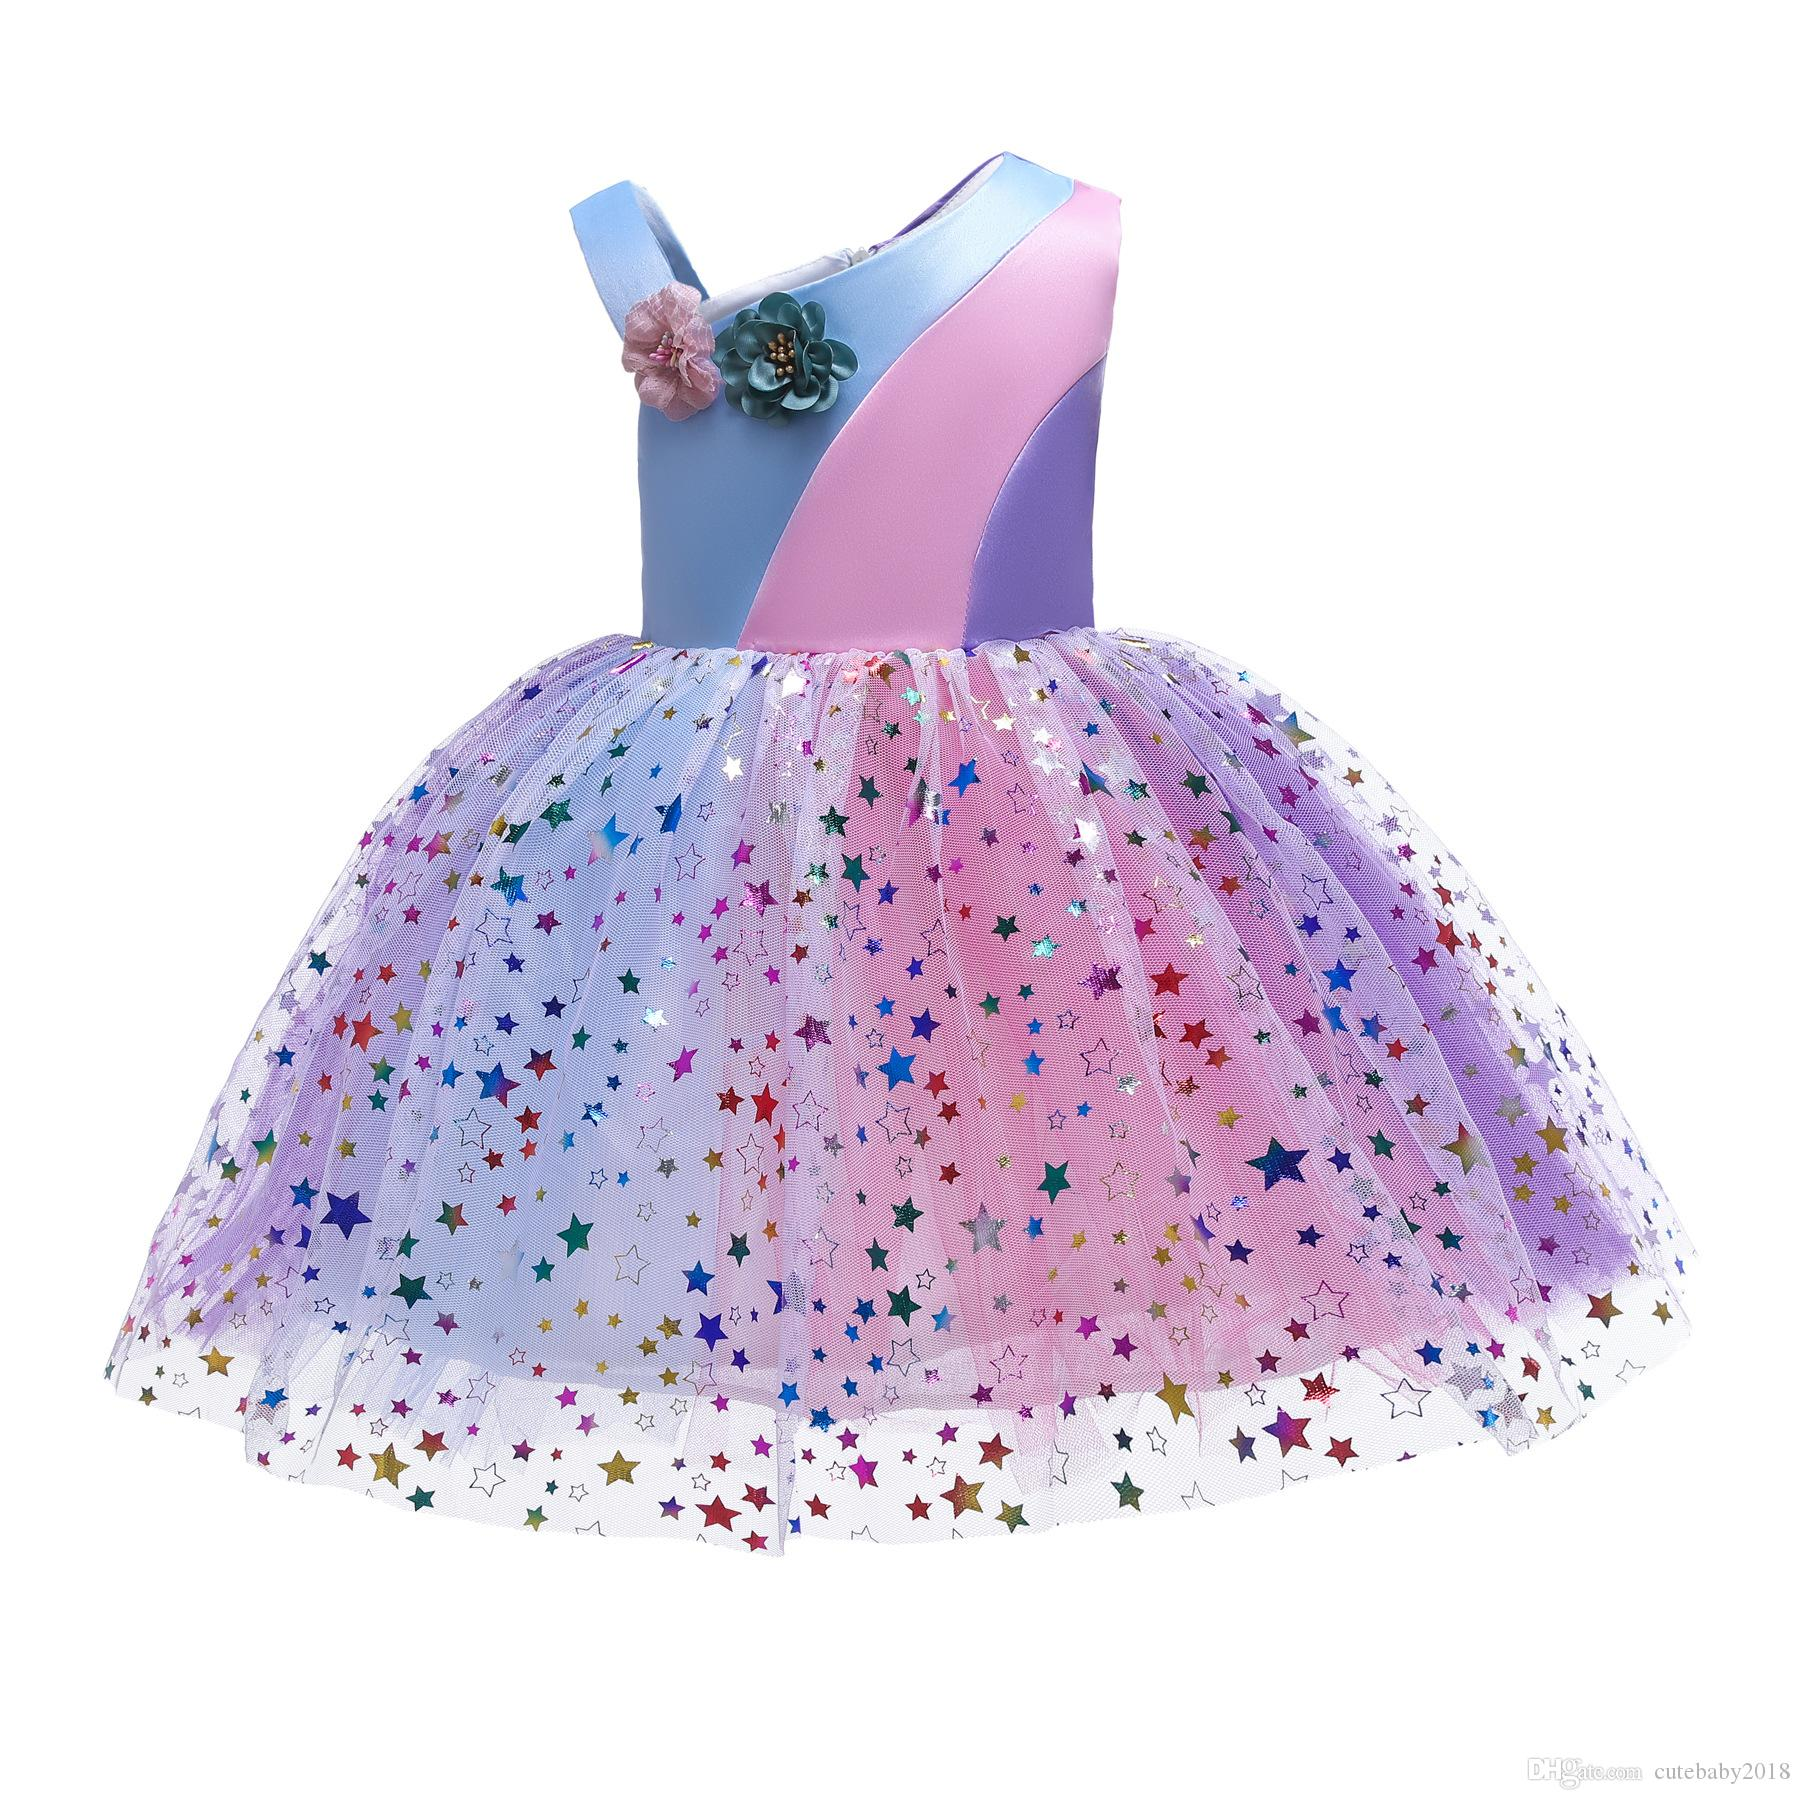 Ins explosion designer baby girls evening dresses rainbow color matching gauze stars flowers party dresses for girls vestido de princesa